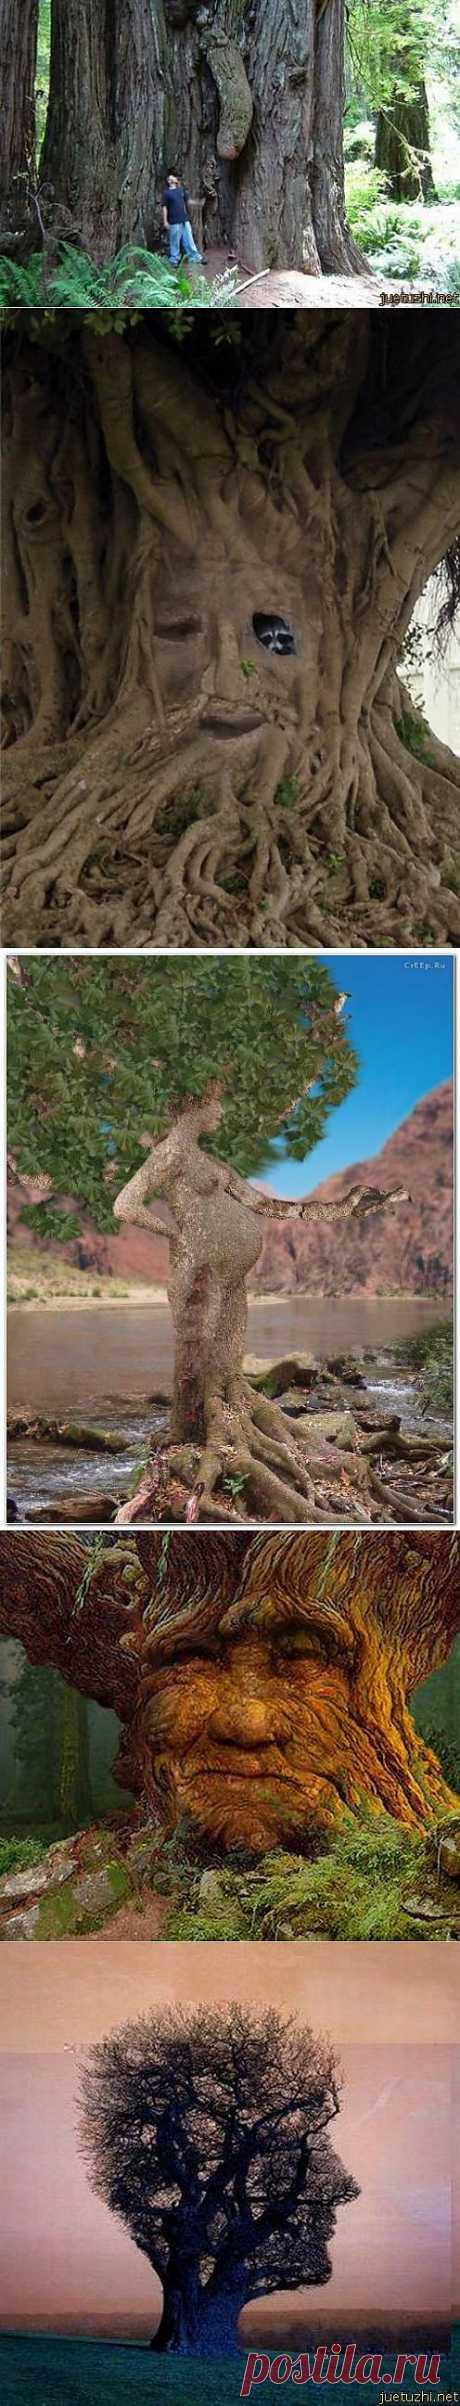 Природа творит чудеса...